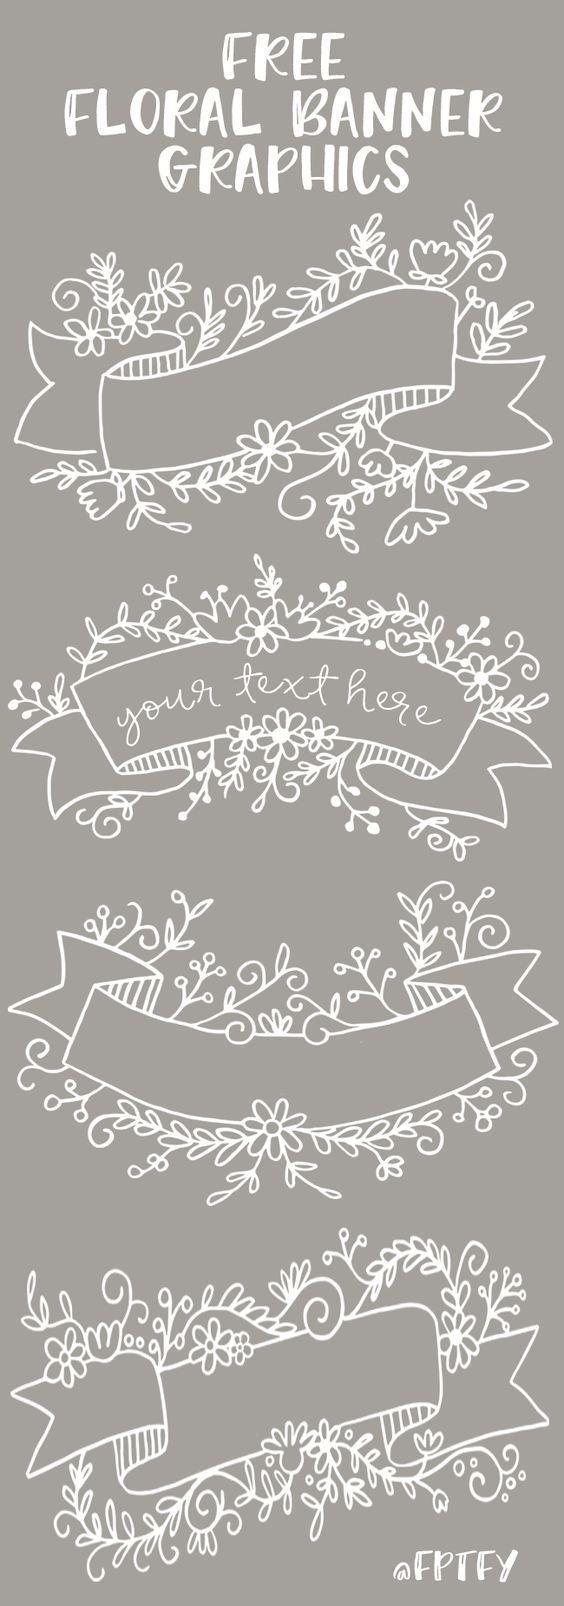 Photo of Pin on Искусство #kalendergestaltenkinder (9) Free Floral Banner Graphi …